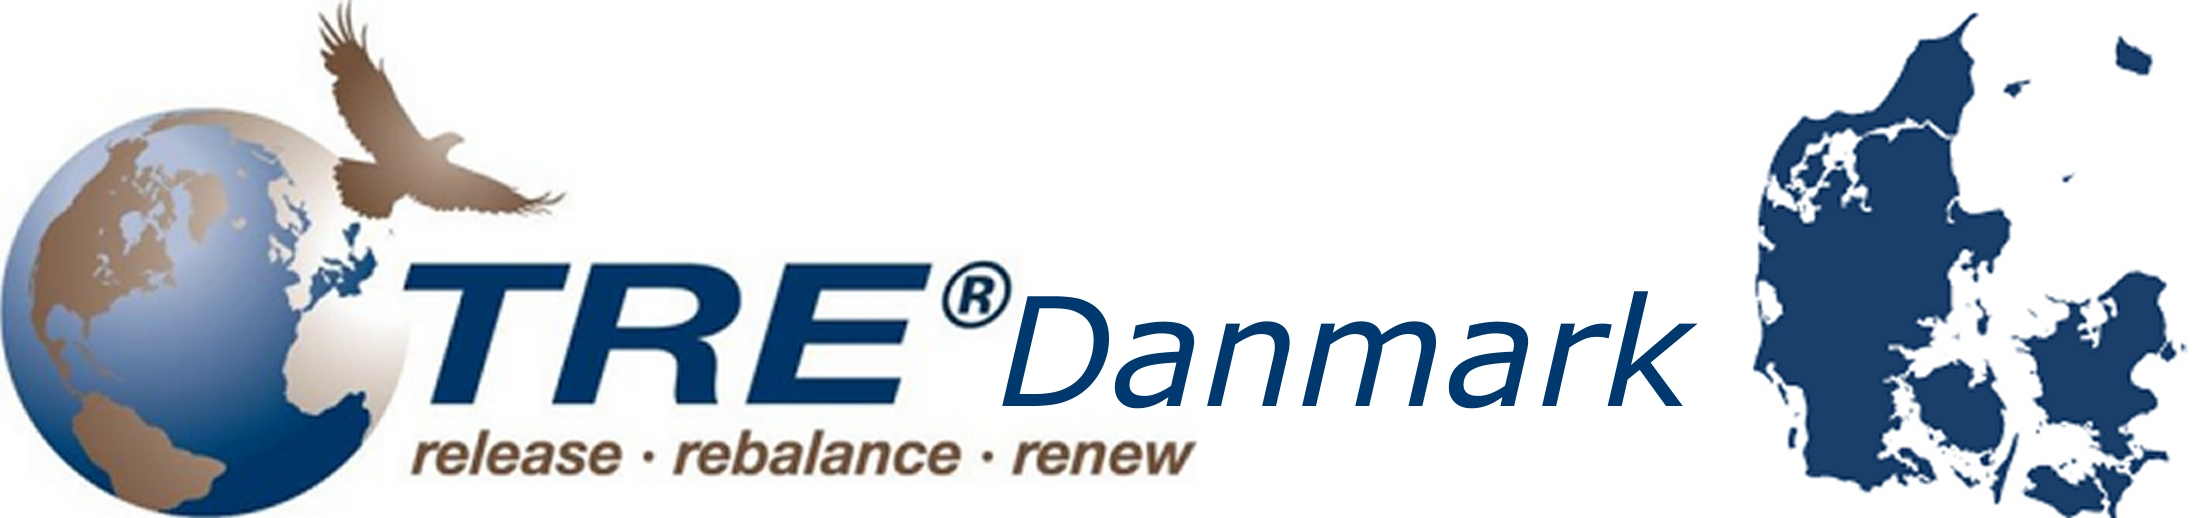 TRE Danmark Mobile Retina Logo